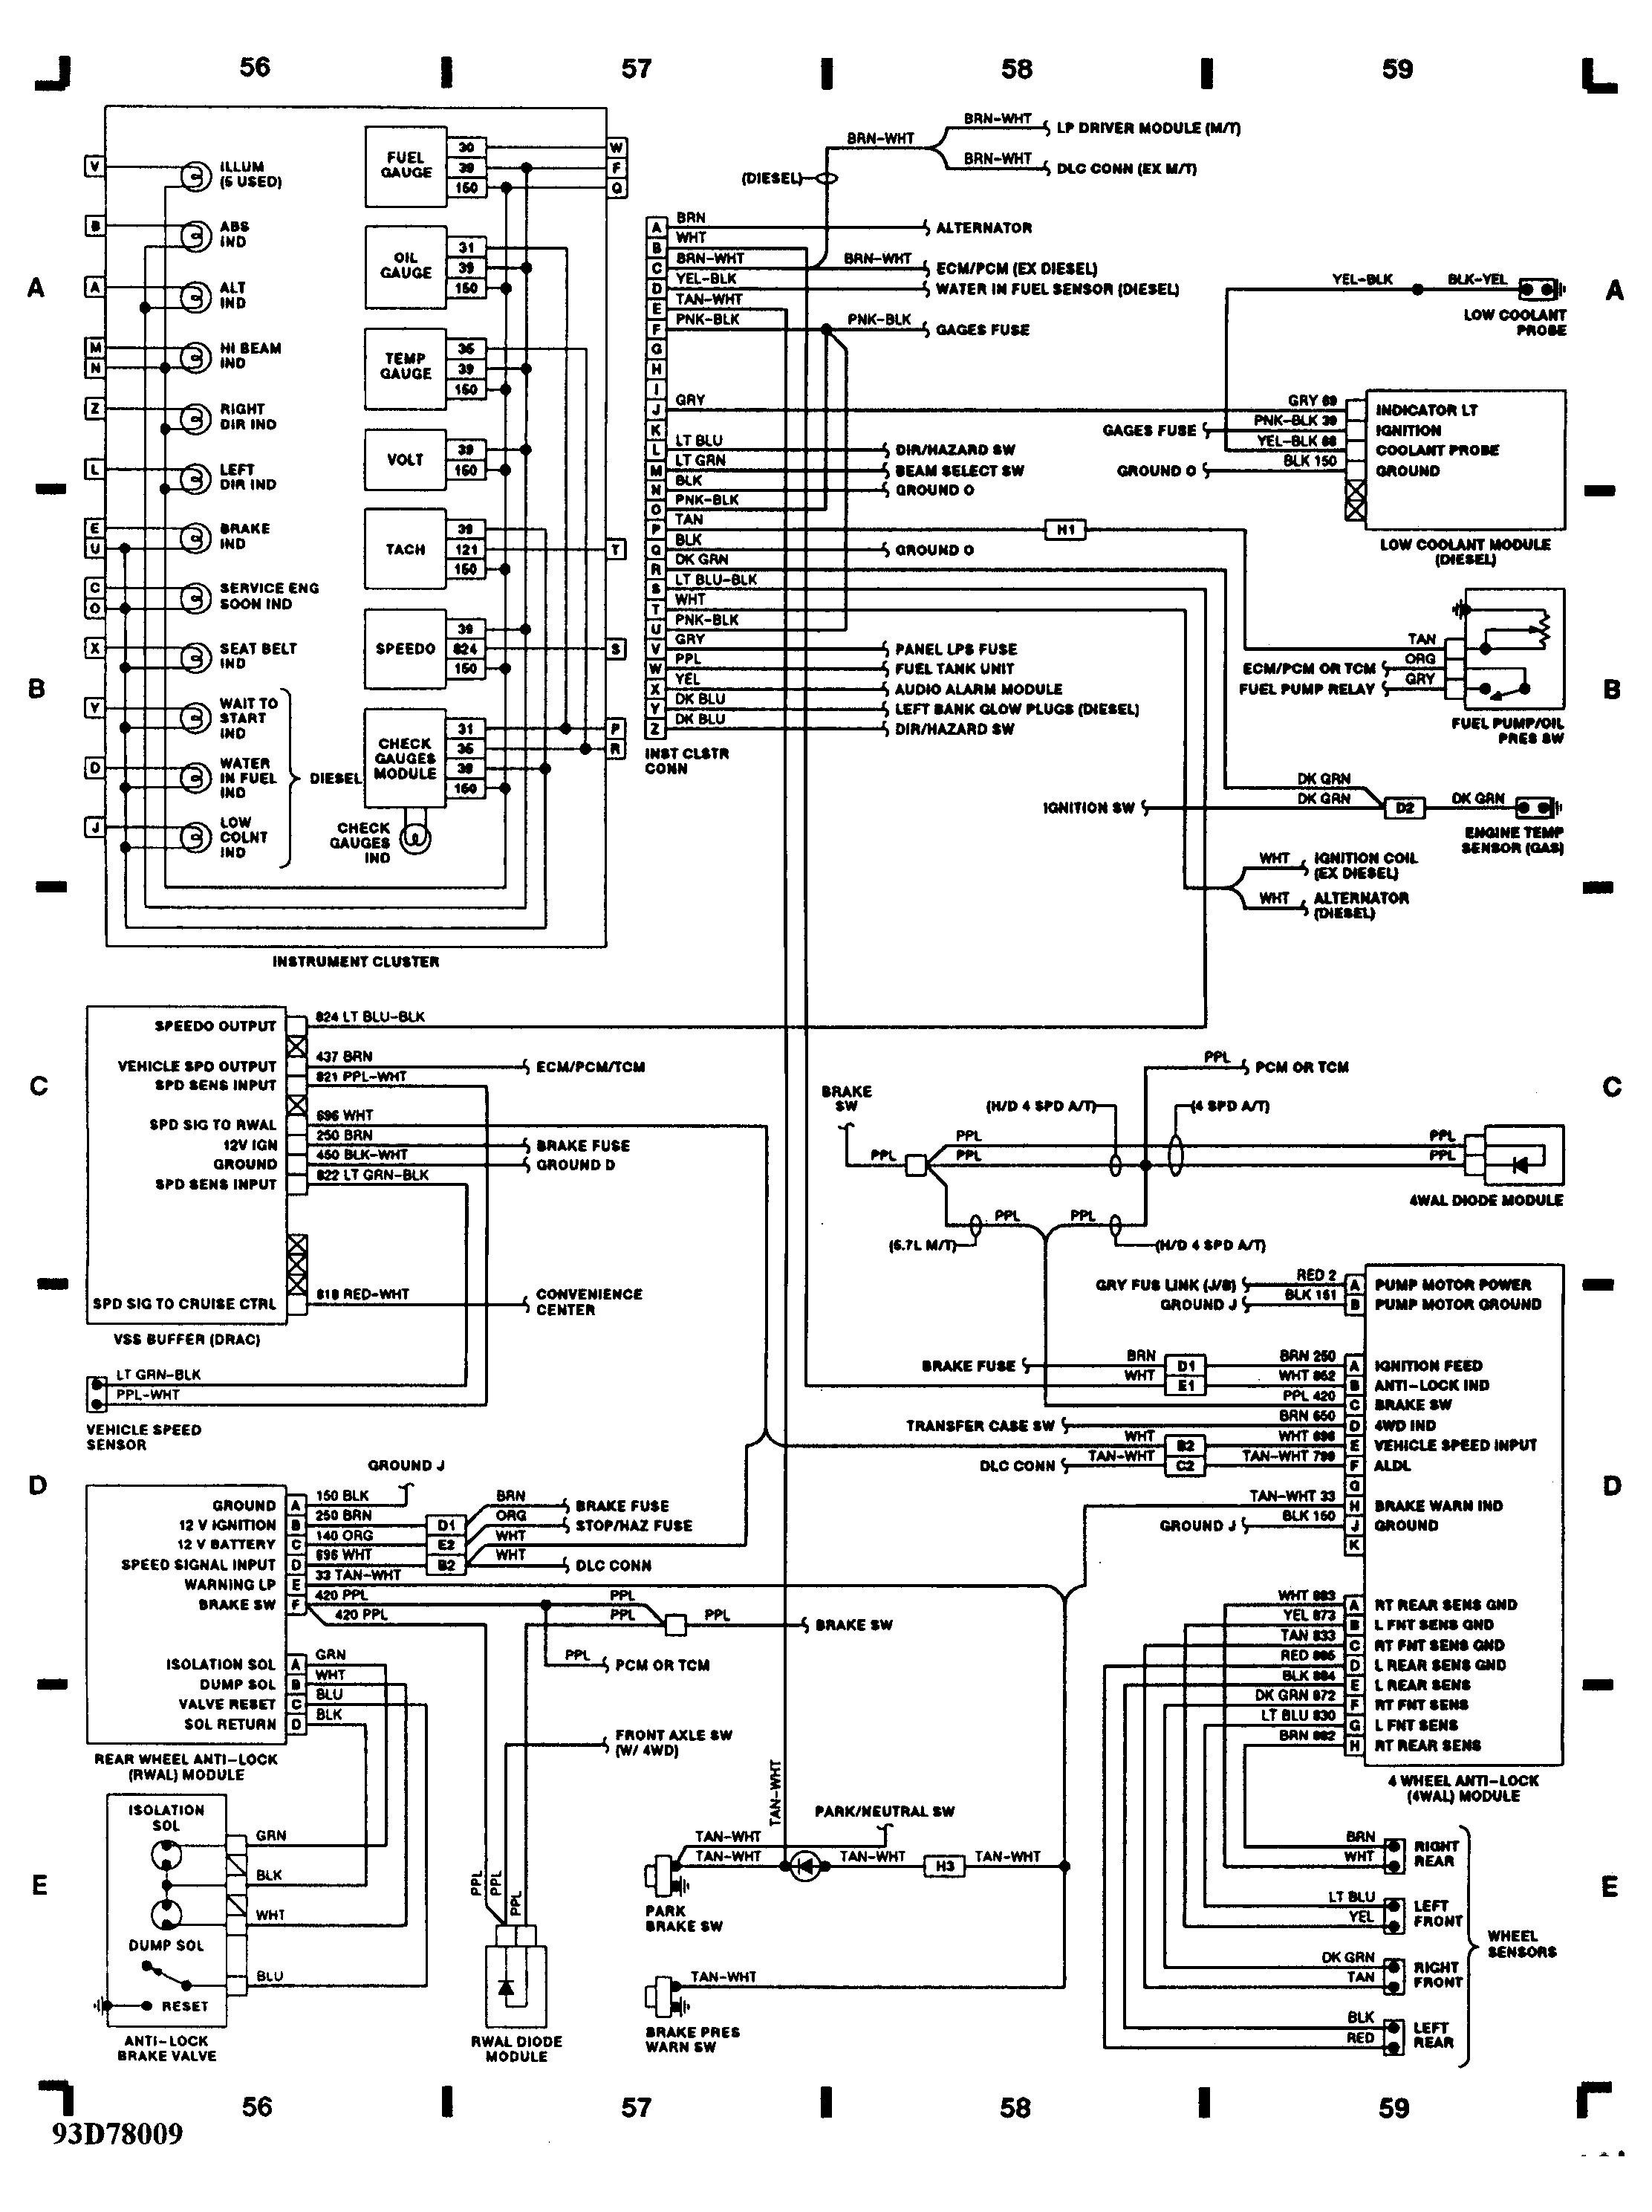 Automatic Transmission Schematic Diagram 5 7 Vortec Wiring Harness Diagram Unique I Have A 93 Silverado with Of Automatic Transmission Schematic Diagram